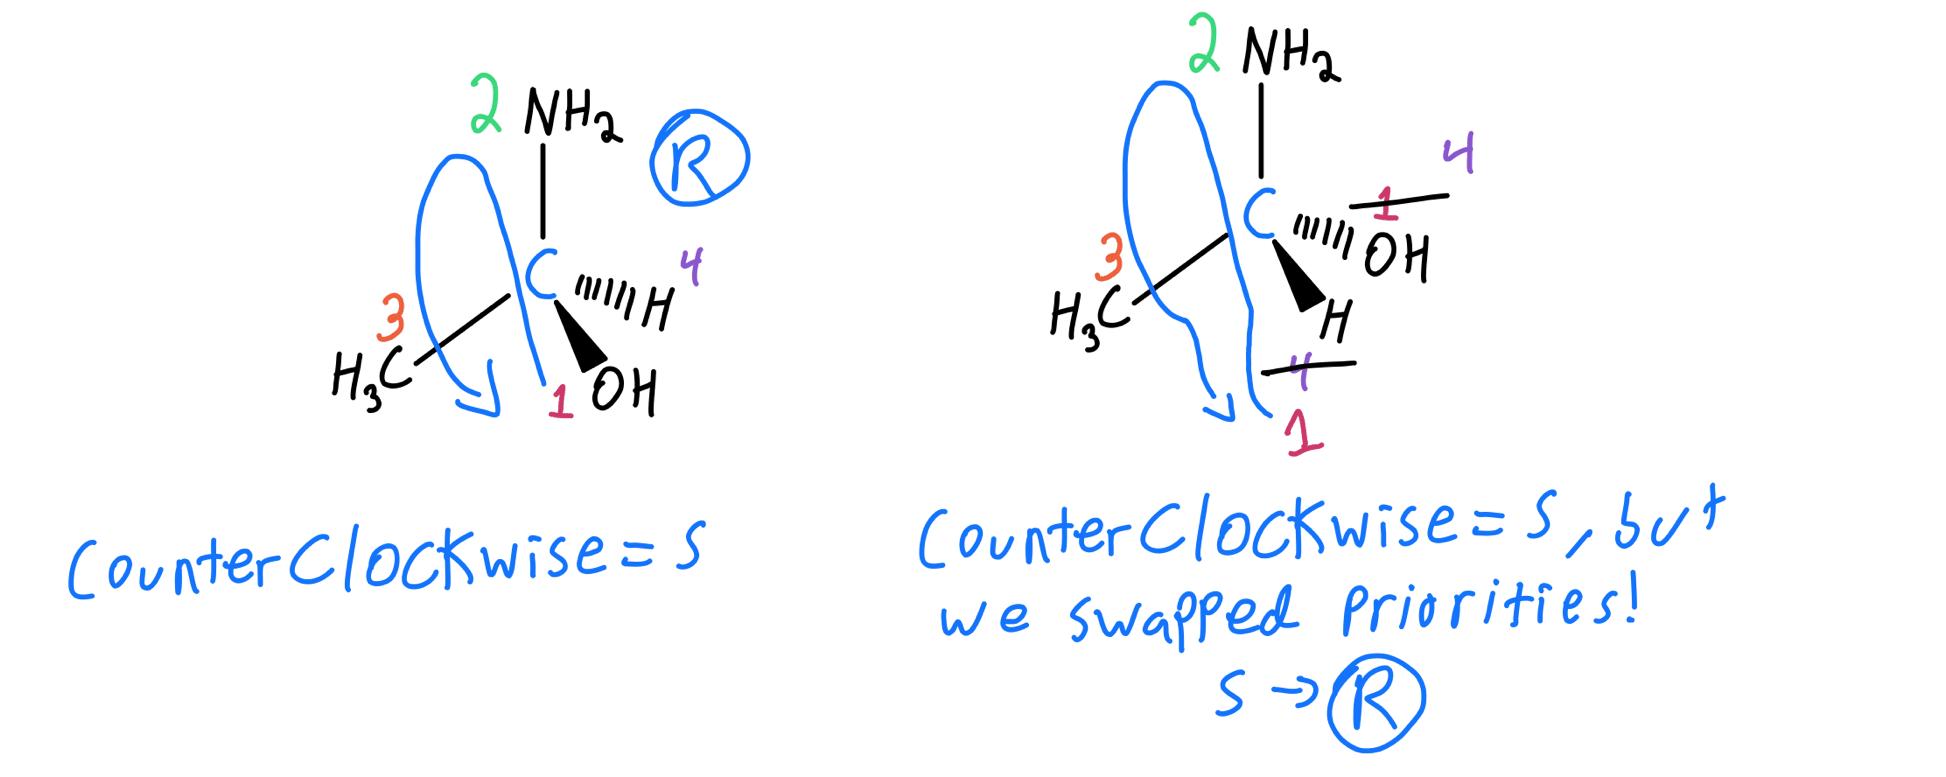 S-1-aminoethanol and R-1-aminoethanol